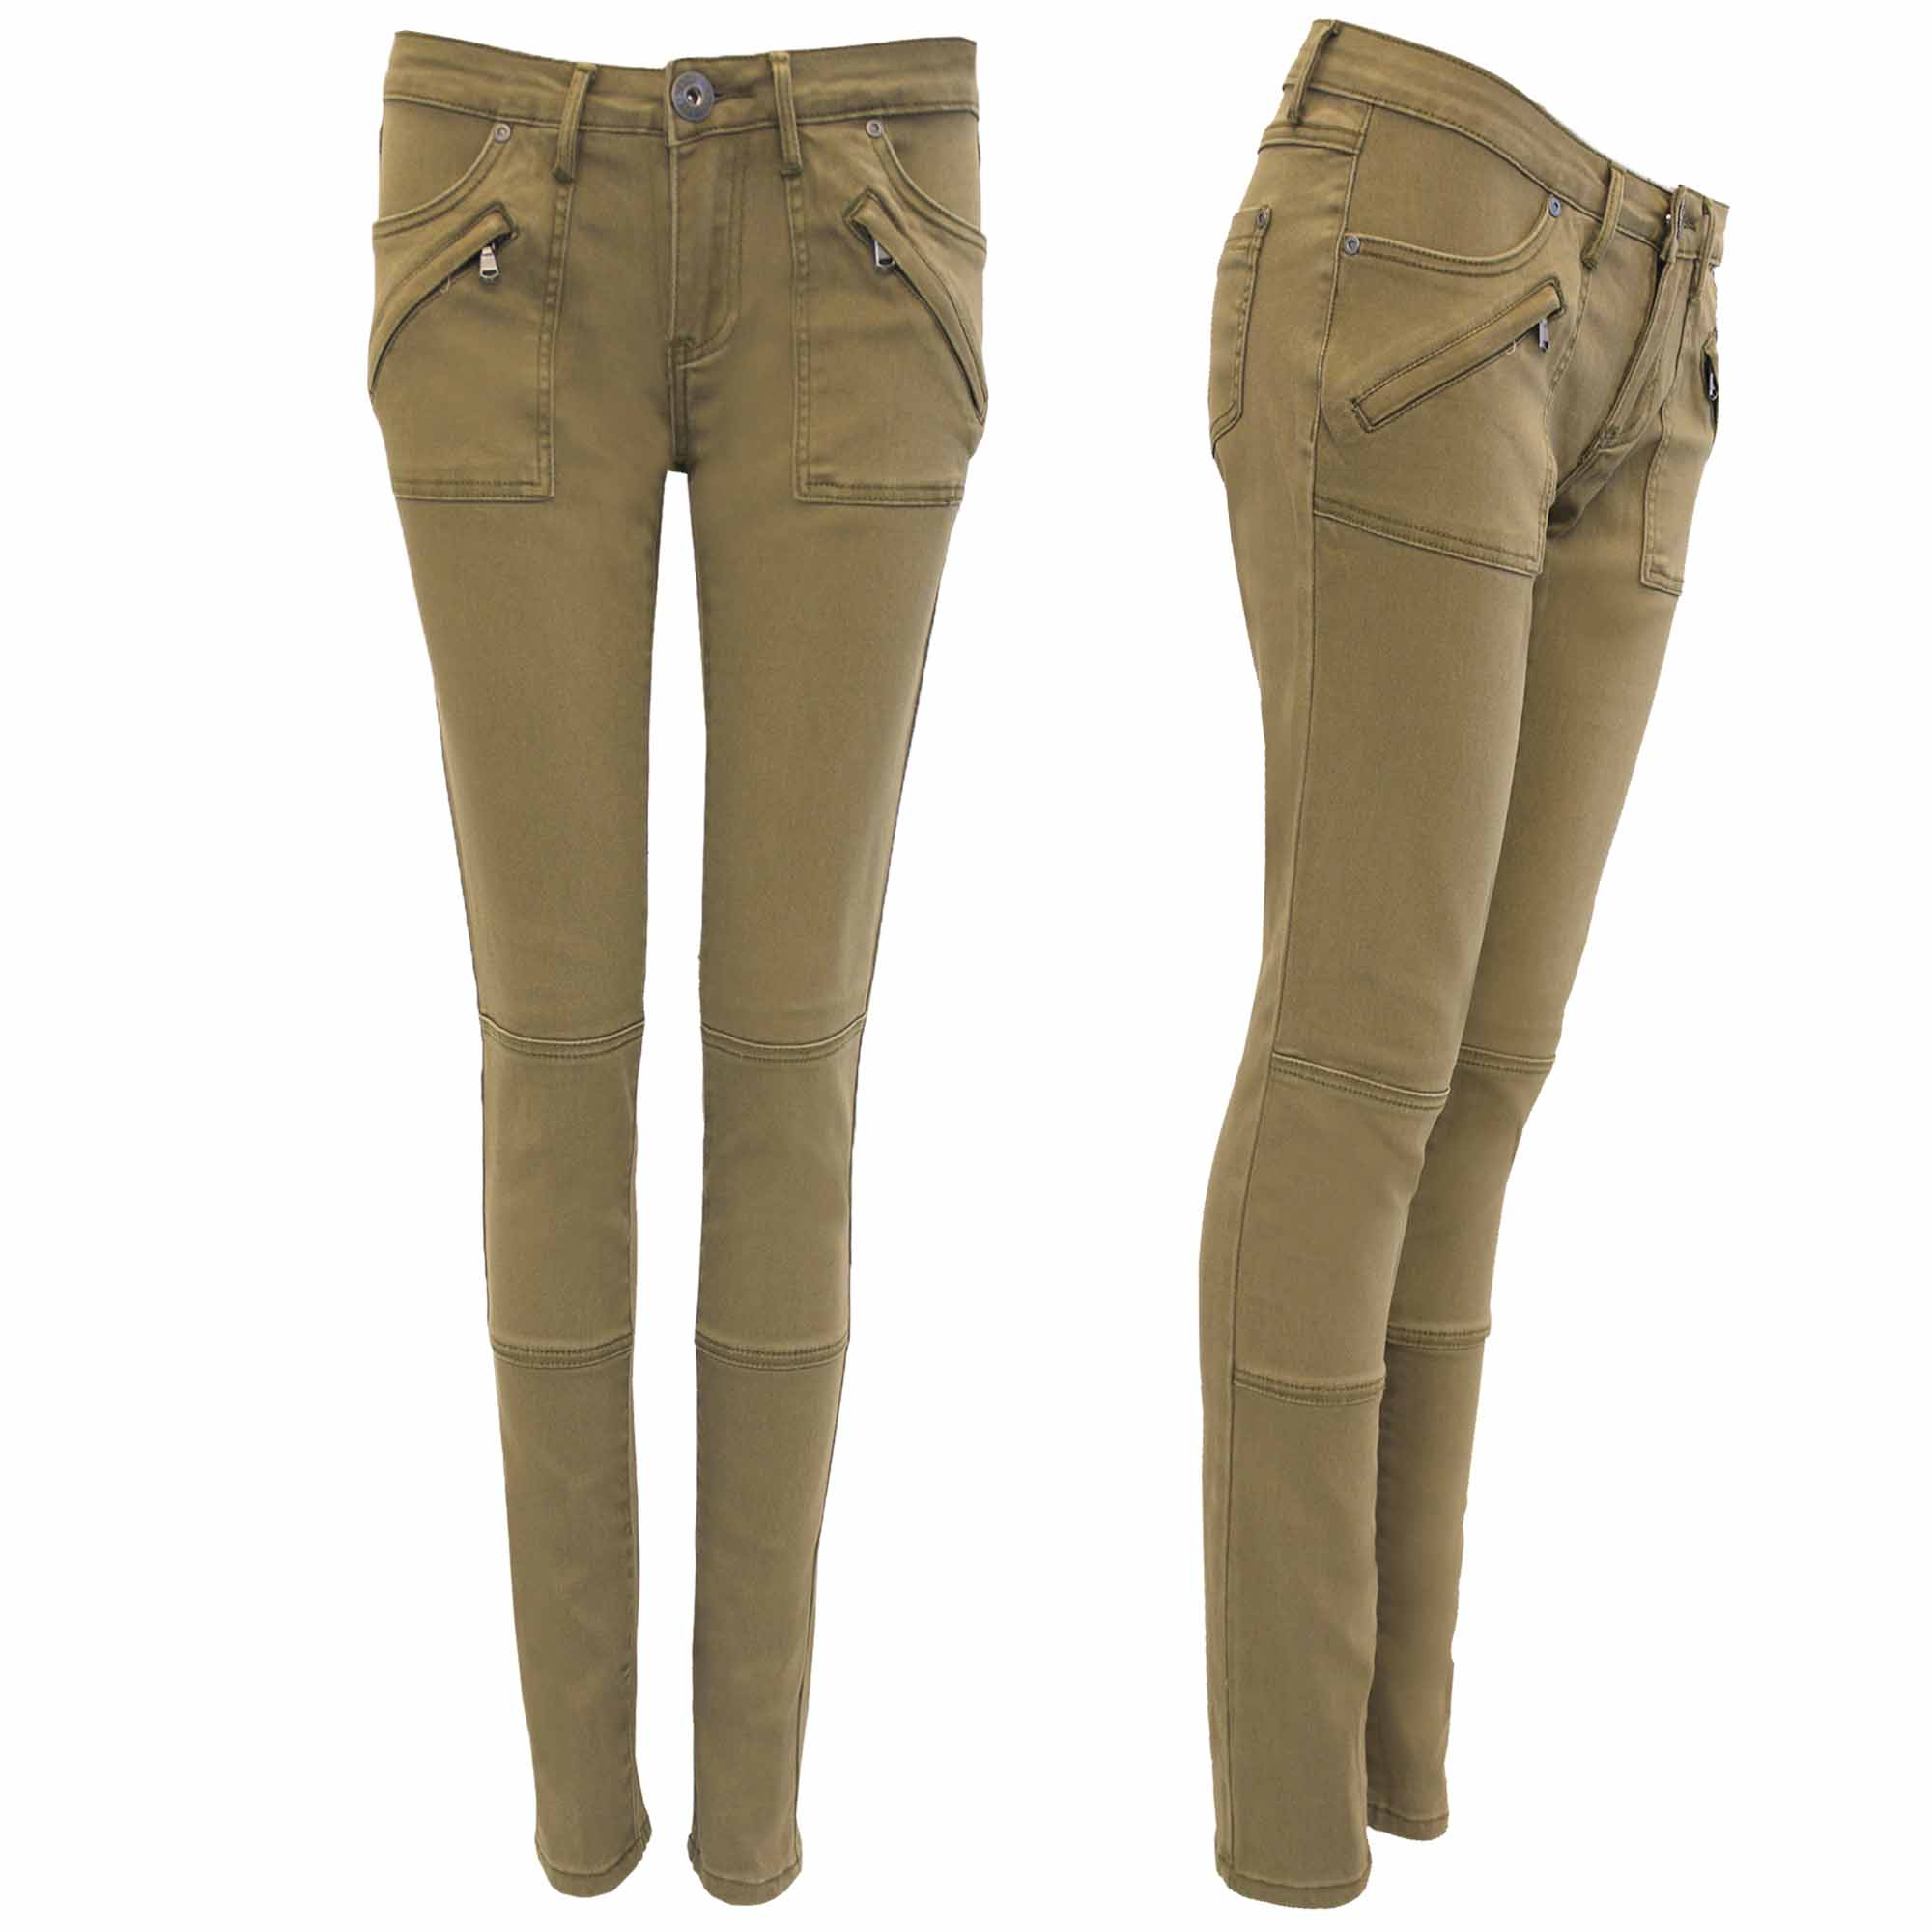 new ladies combat skinny fit jeans women zip cargo khaki trousers slim look  6-14 lbkimlw